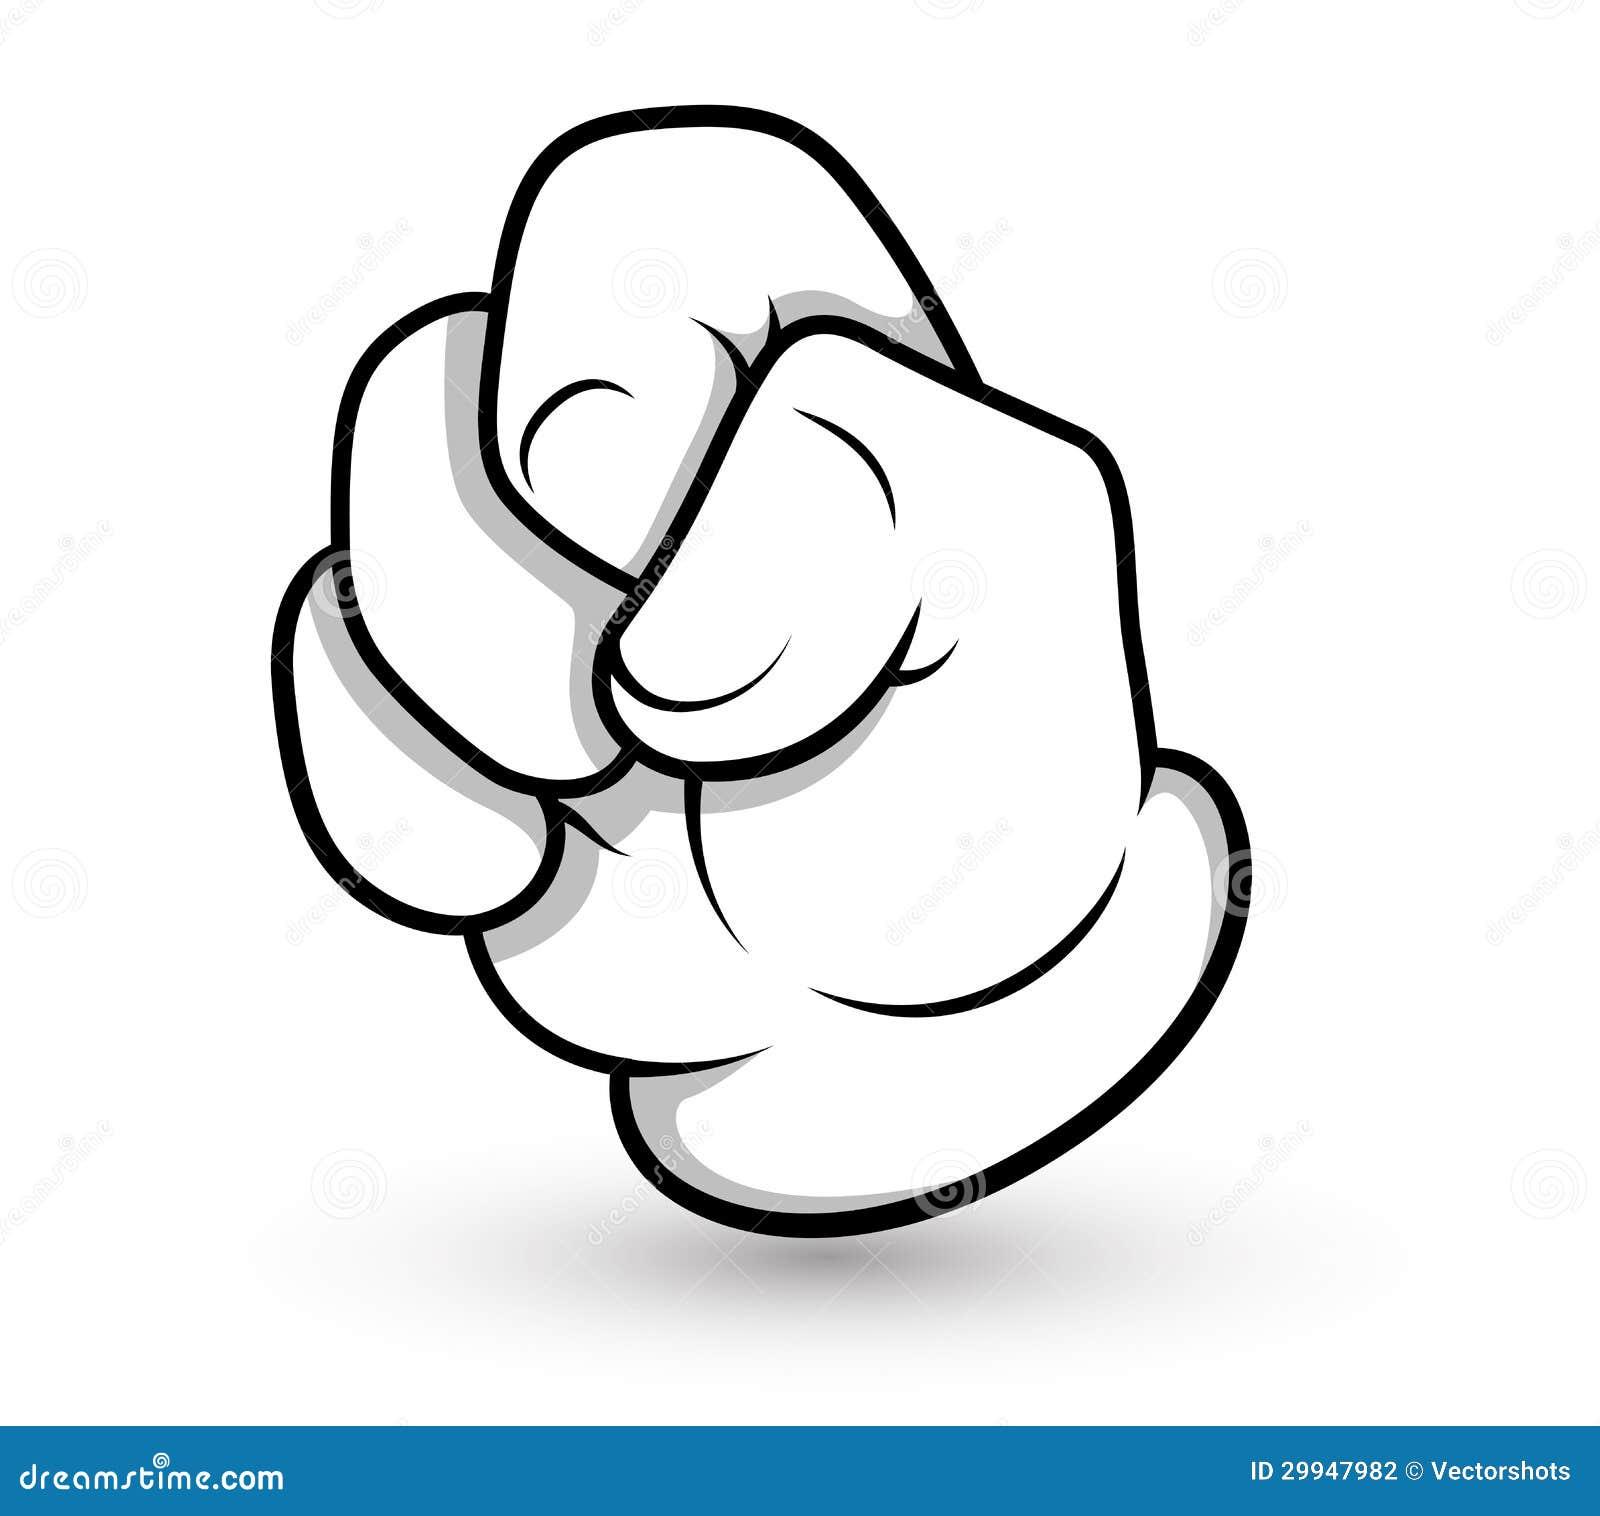 Cartoon Hand Gesture Stock Photography - Image: 29947982